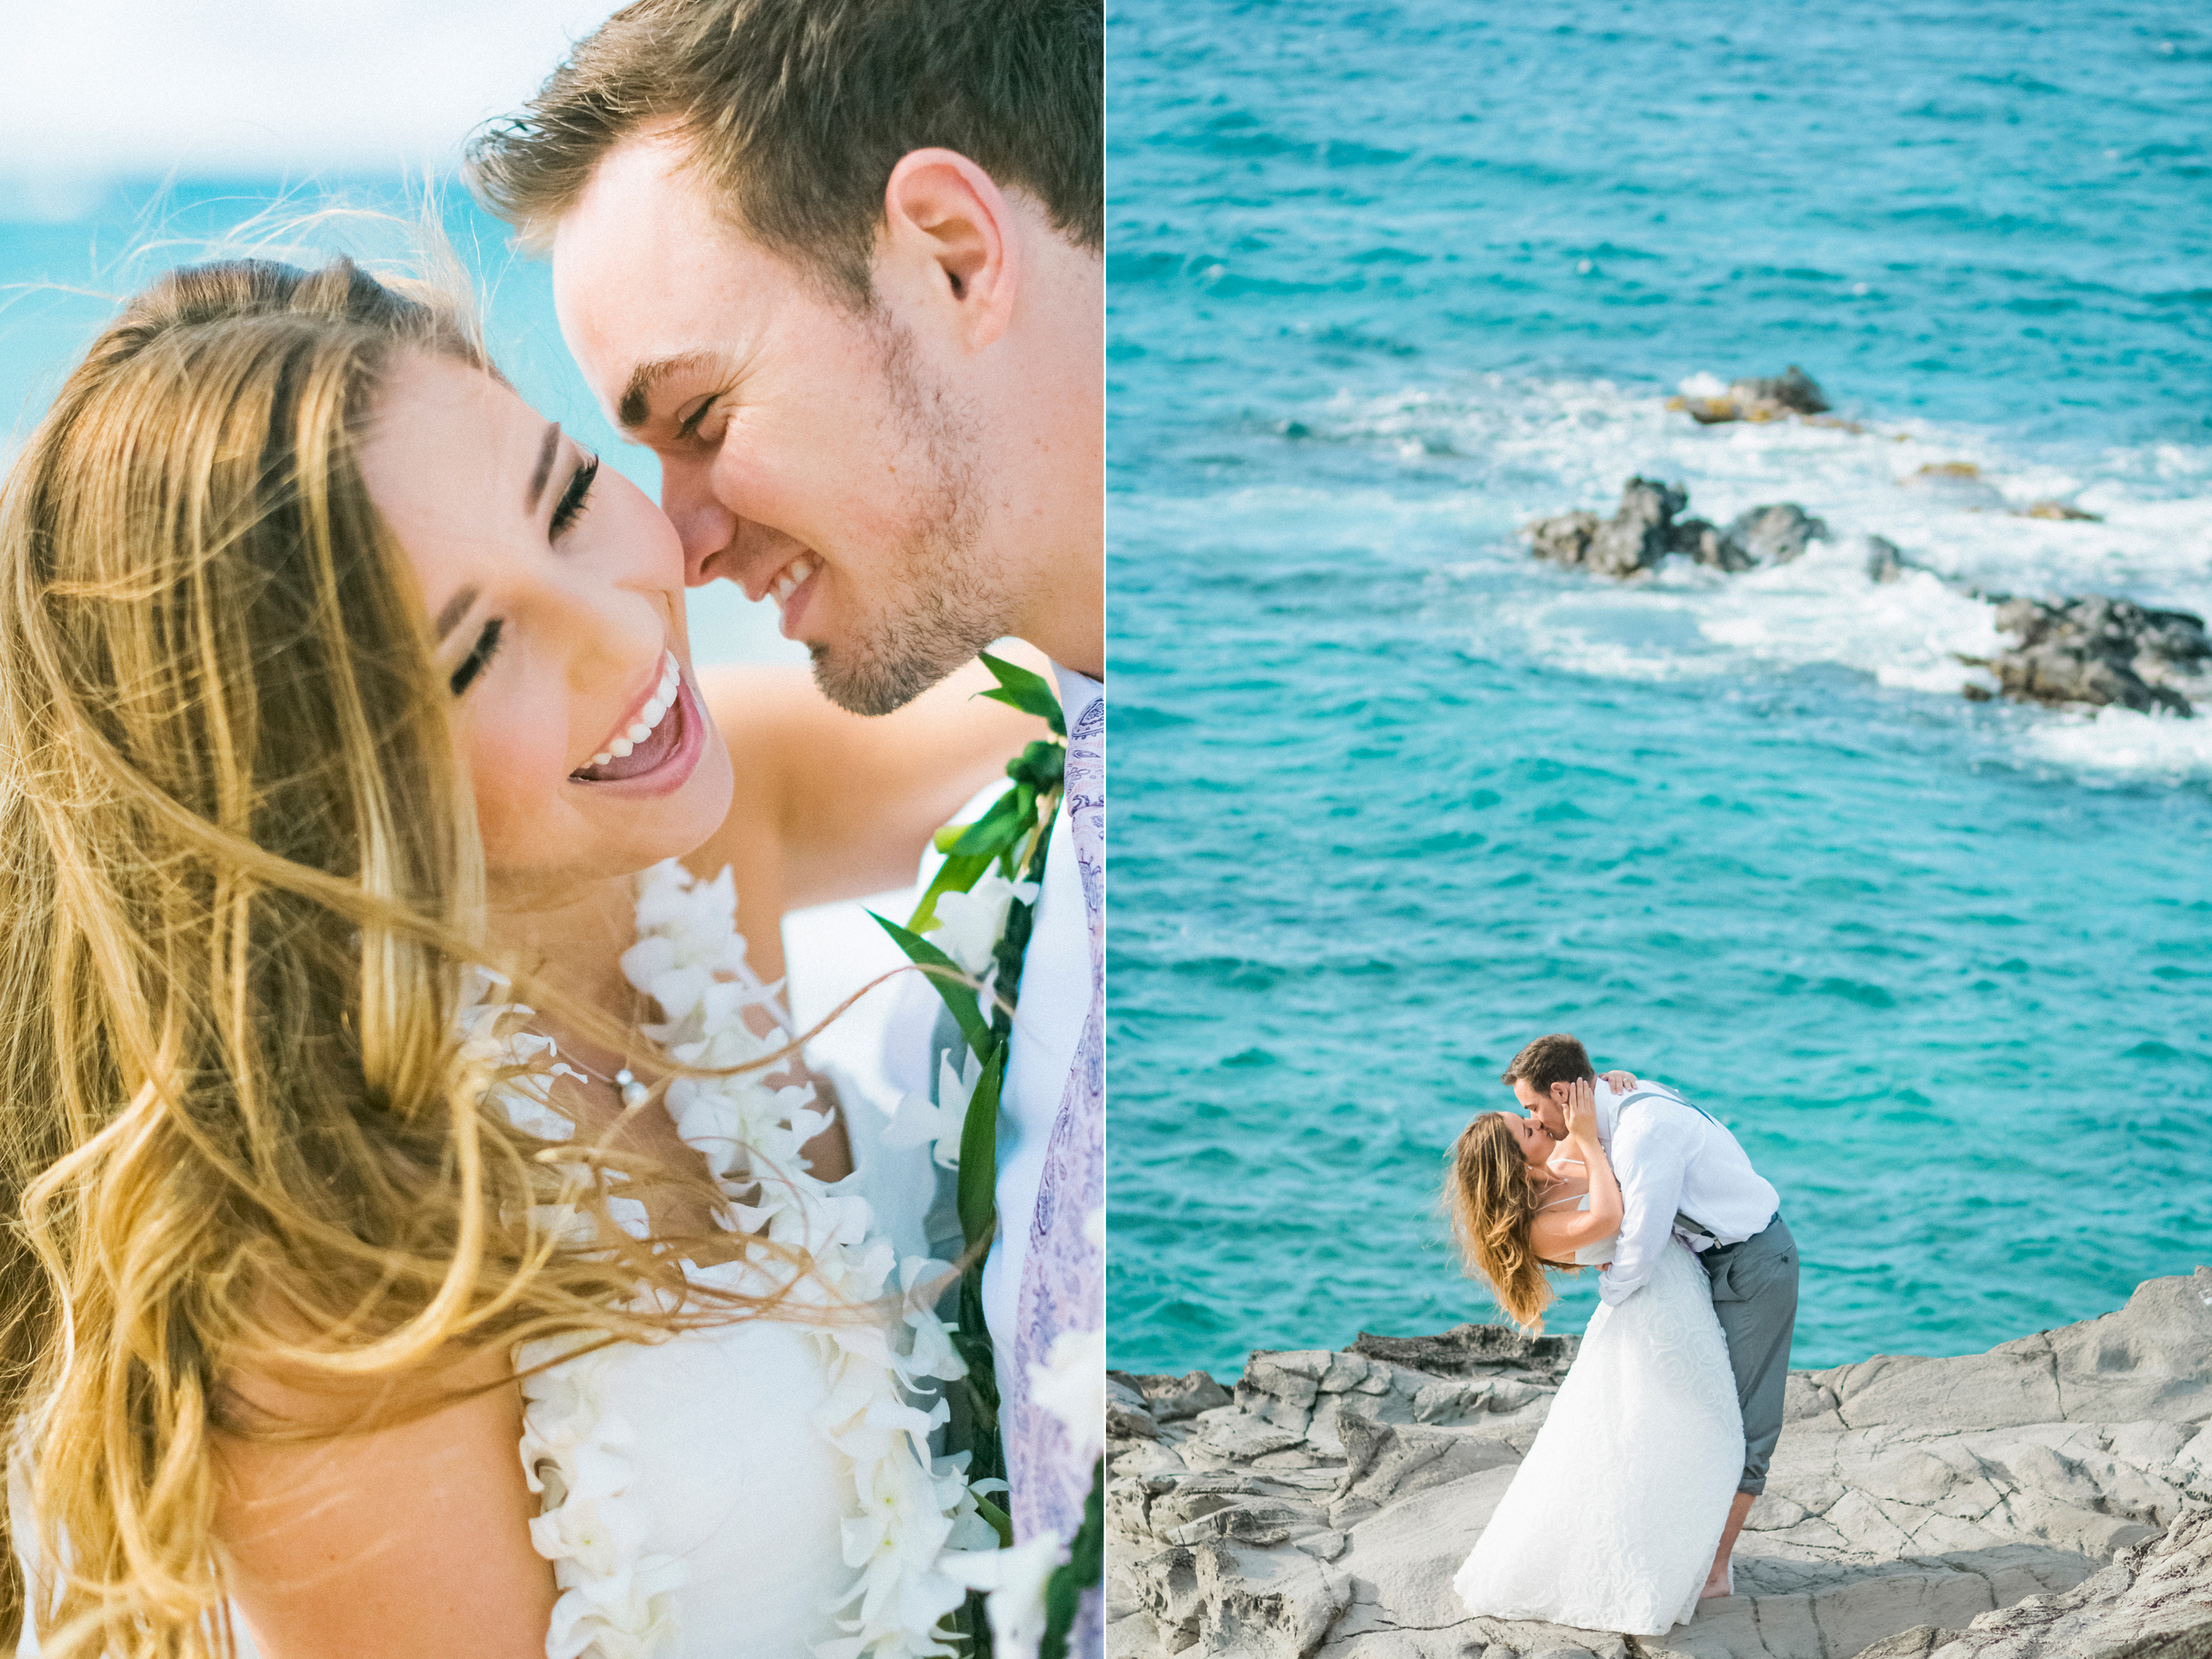 angie-diaz-photography-maui-ironwoods-beach-wedding-5.jpg